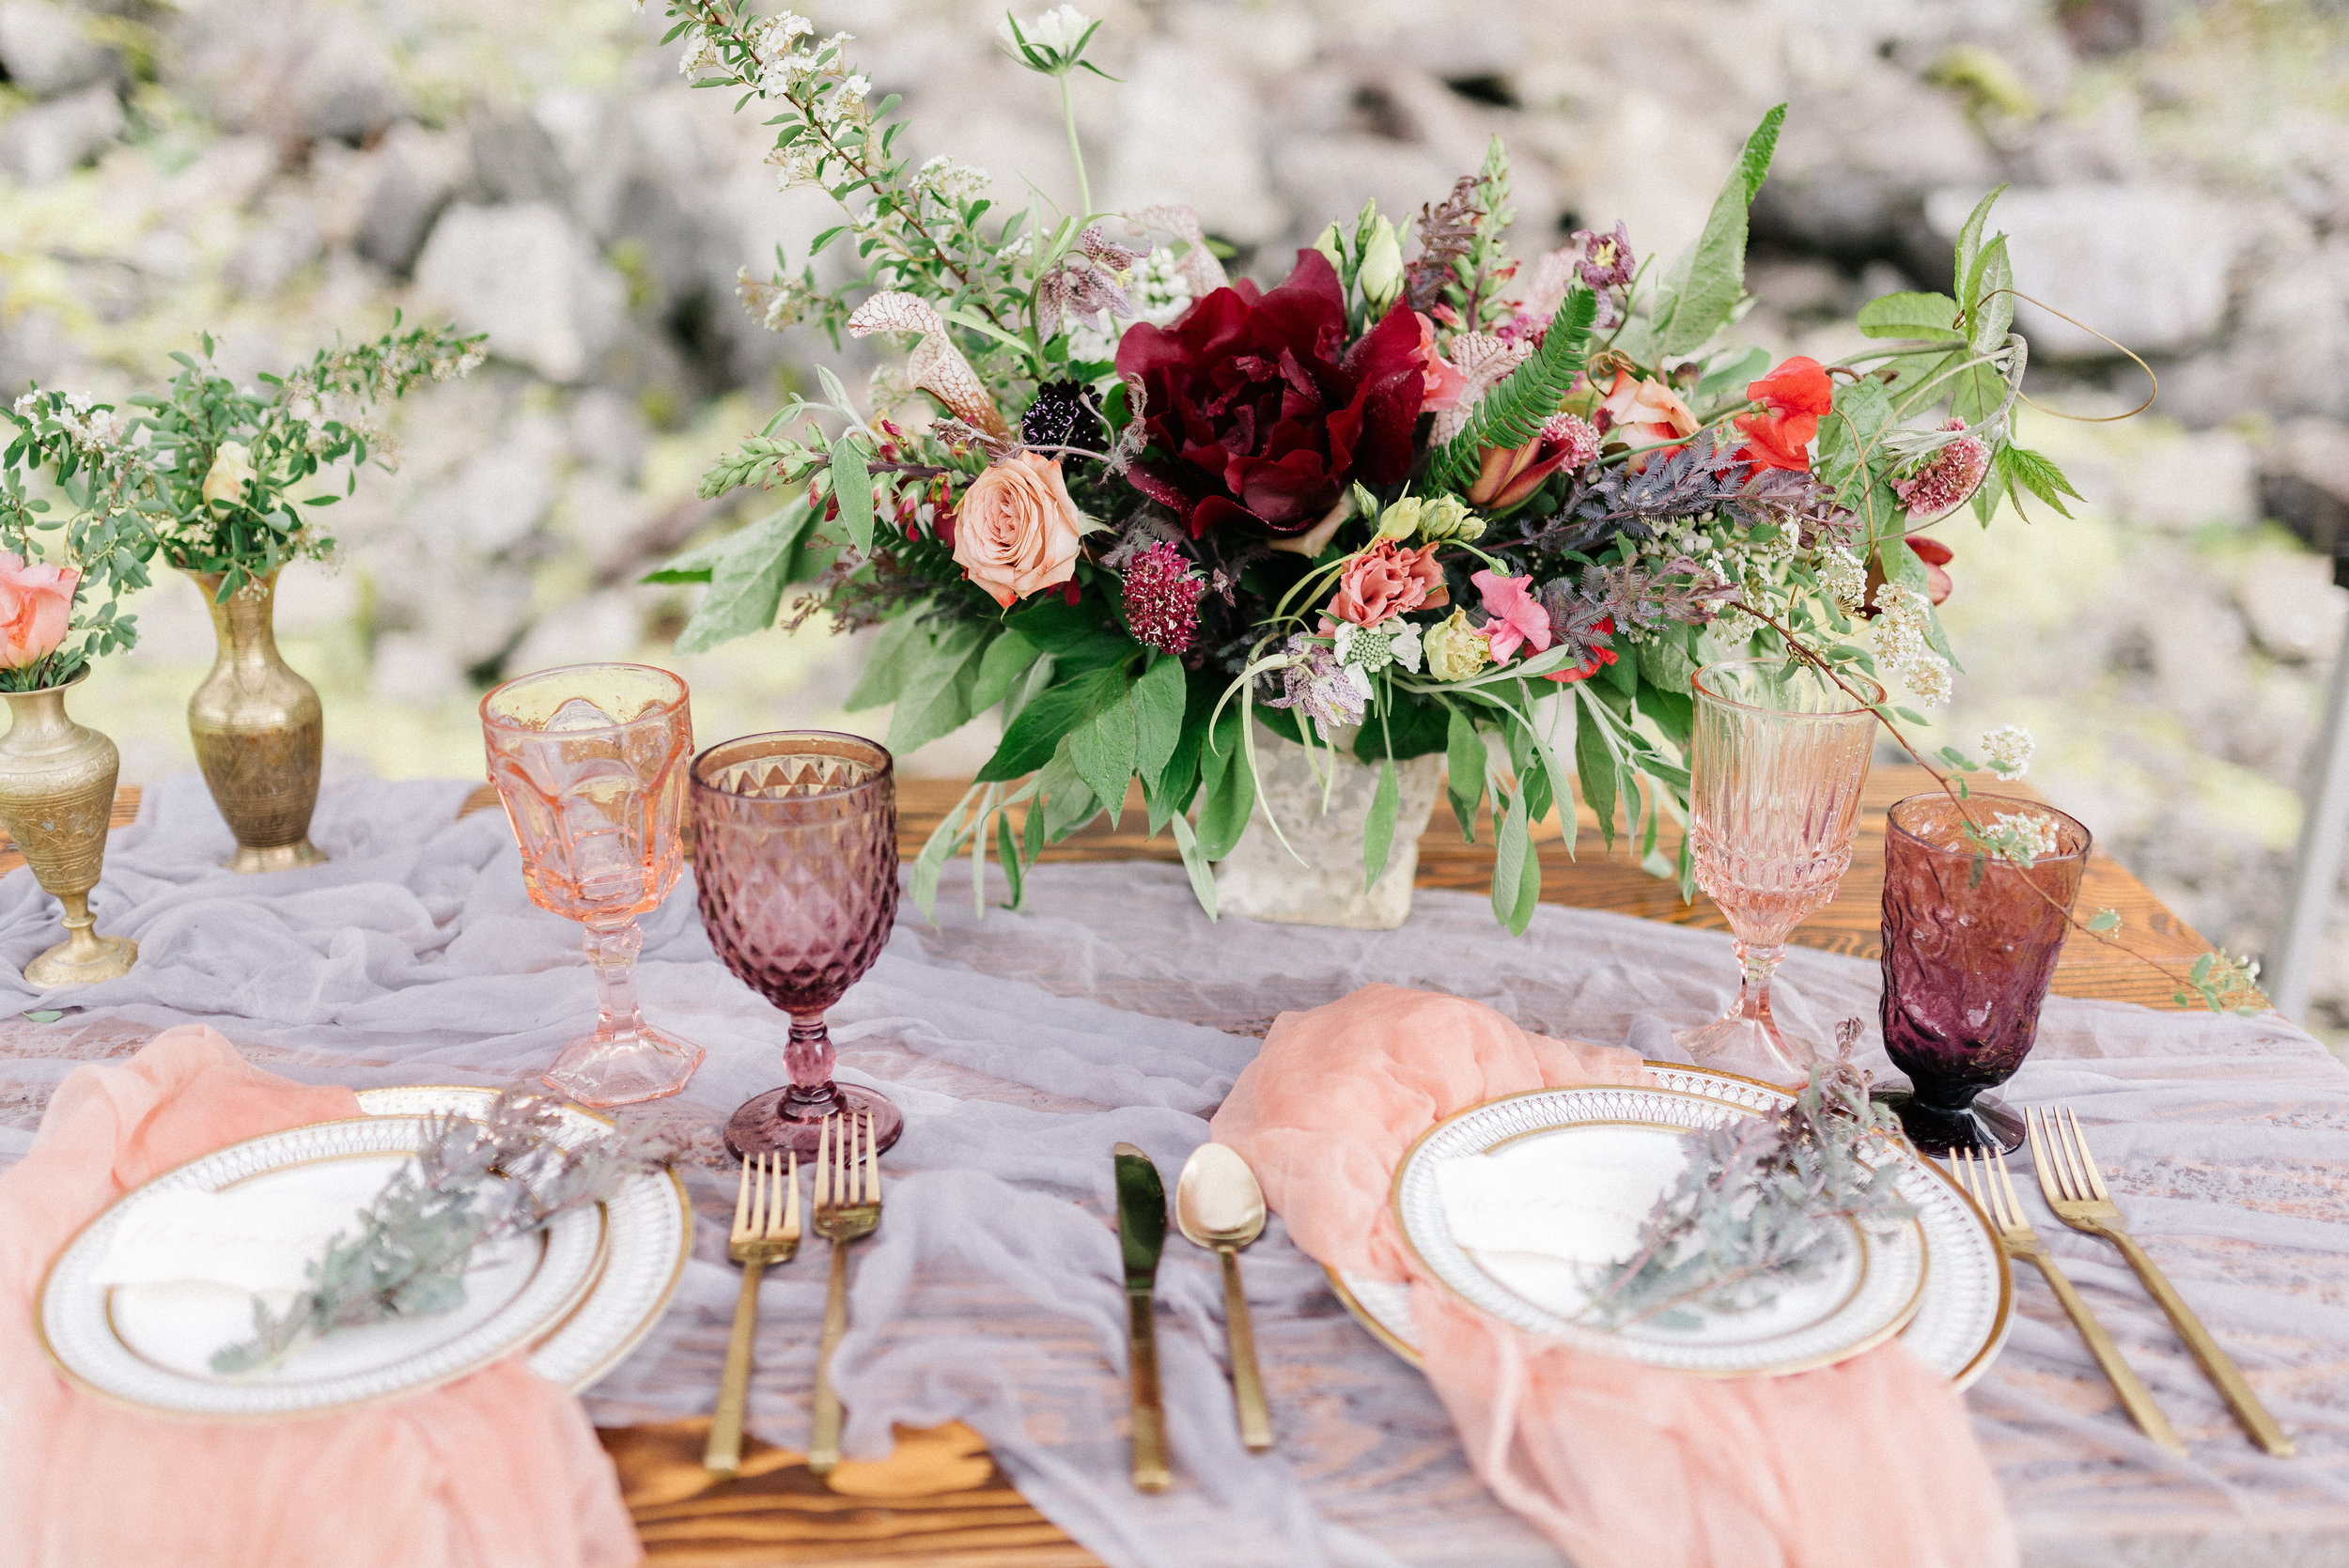 wedding flowers in a basket